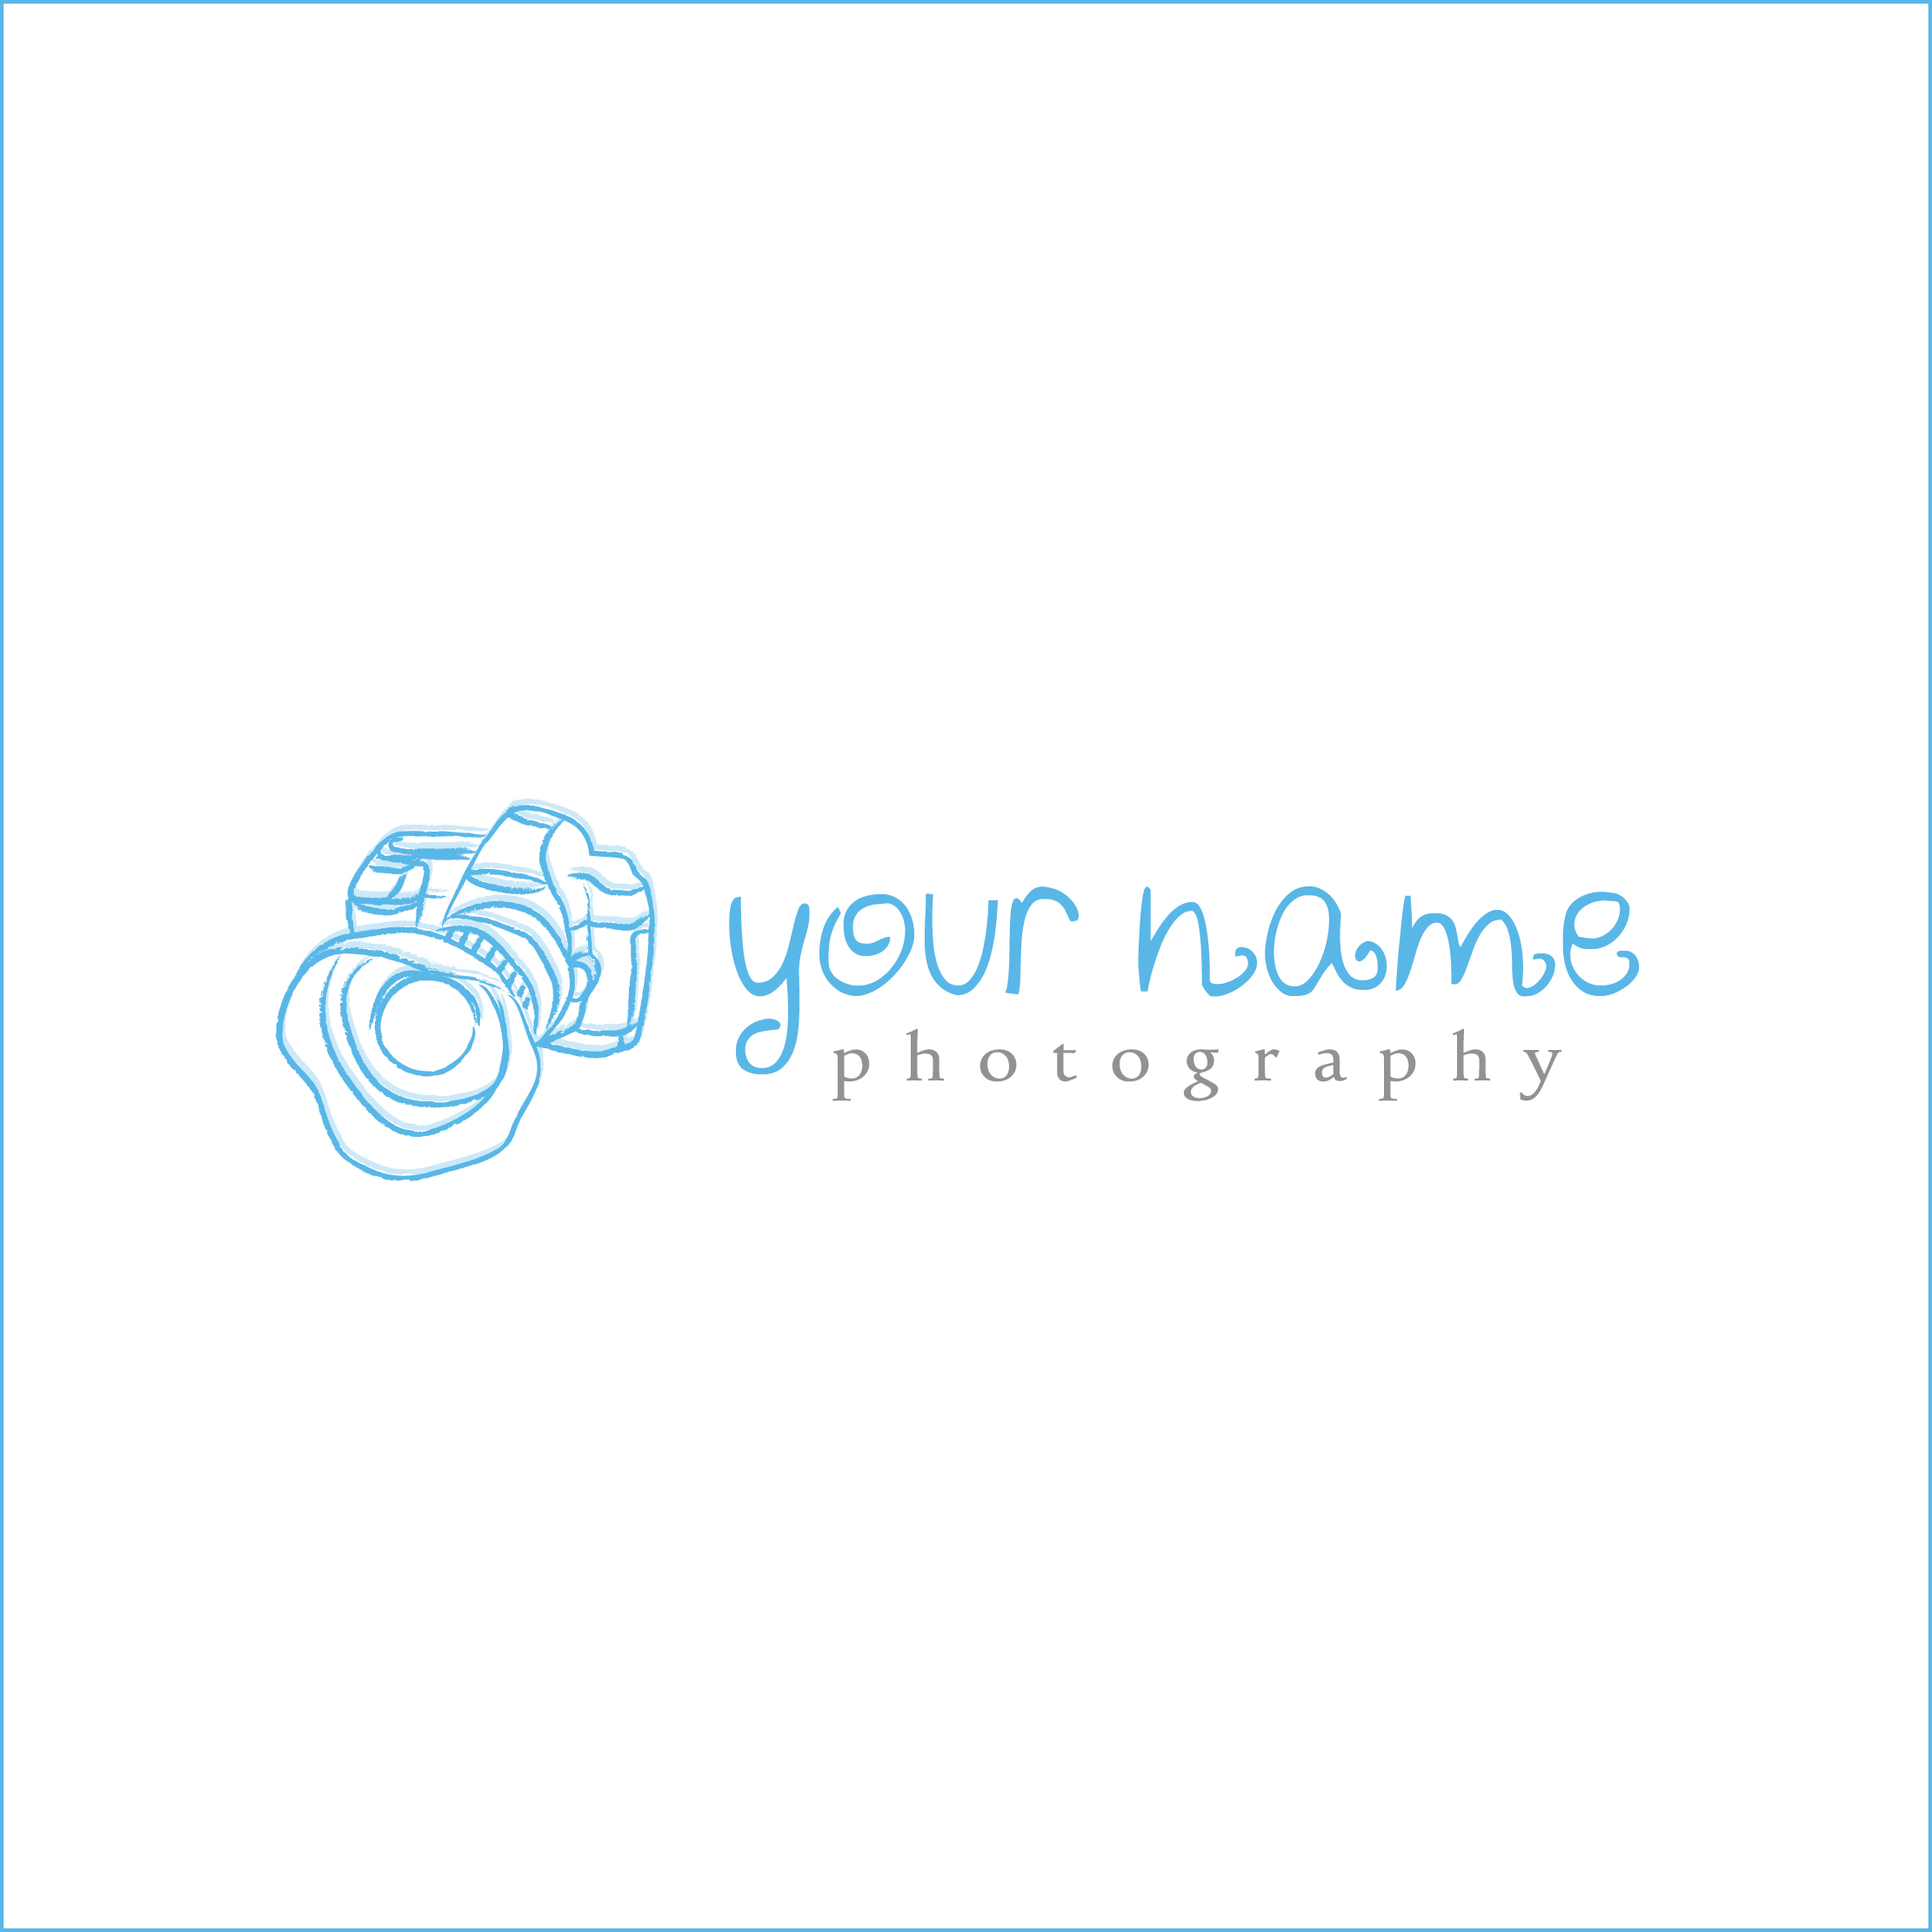 Photography Logo Design Free - Zamlout Photography Logo By Hanan Design Gz